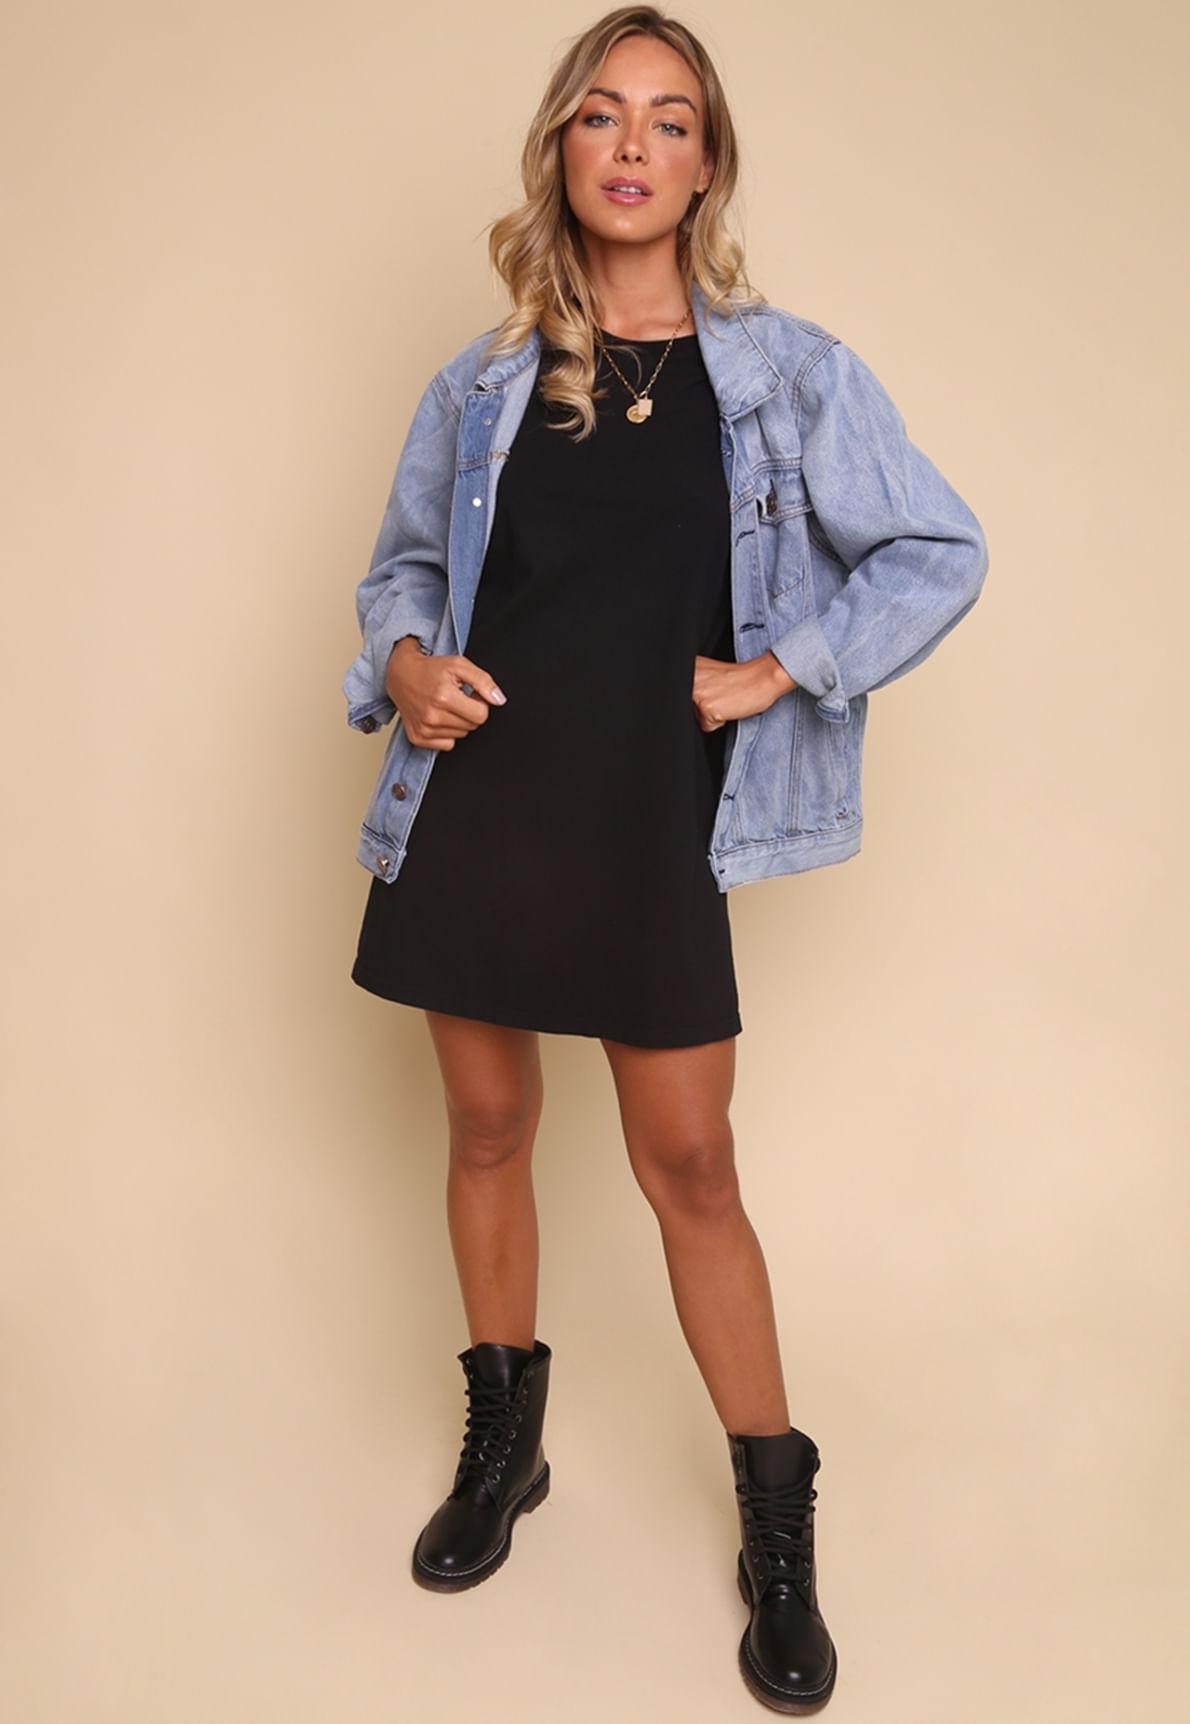 30104-vestido-camiseta-preto-california-days-mundo-lolita-04